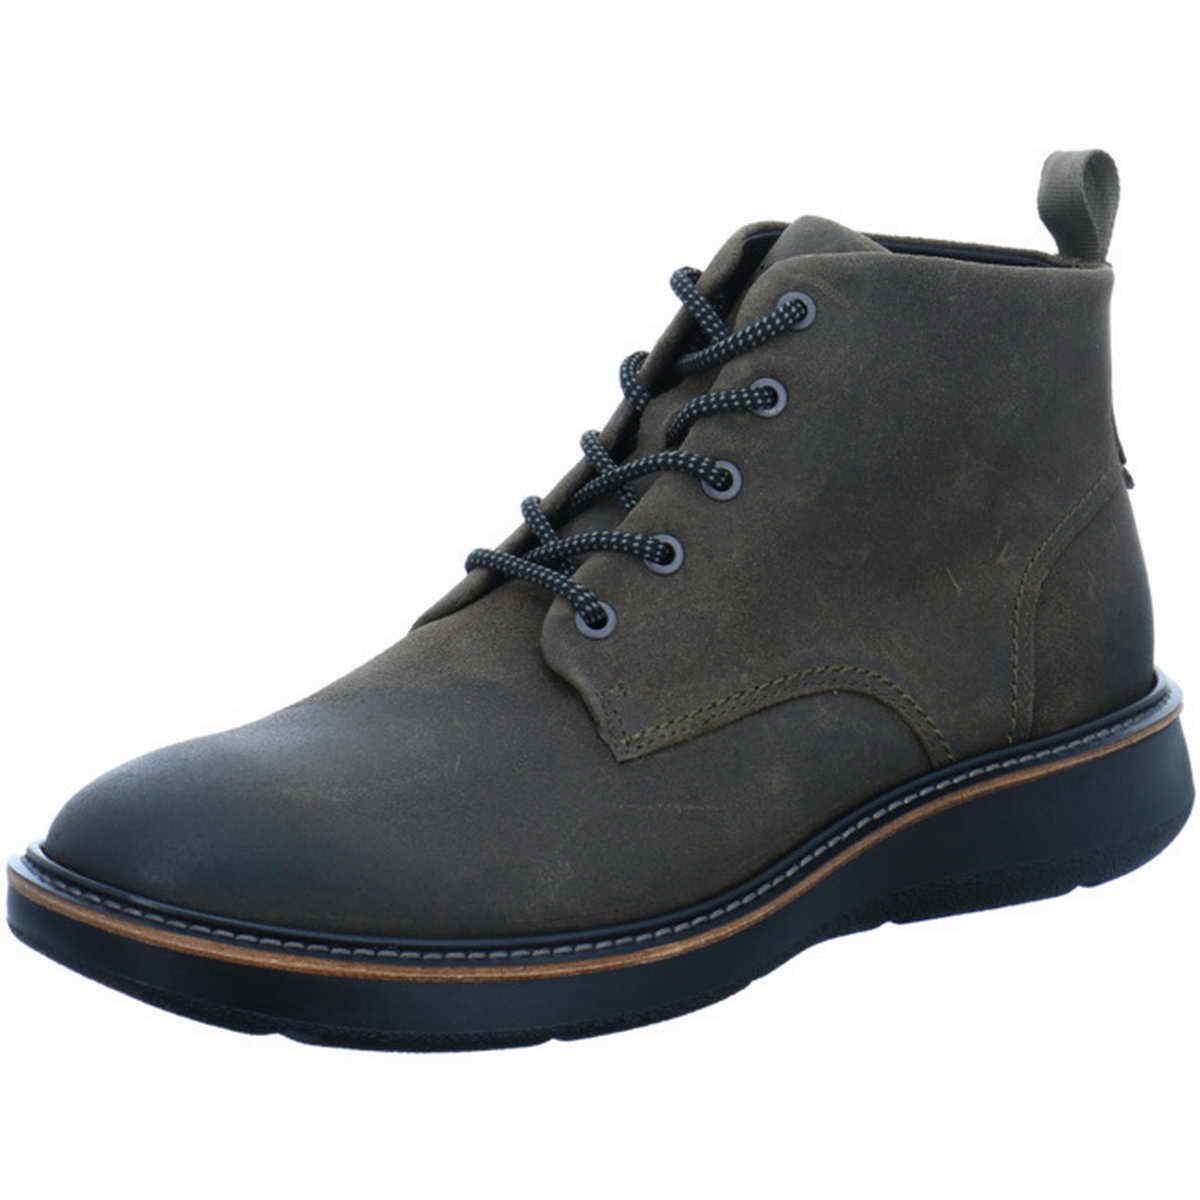 Ecco Boot Aurora grey green tarmac Leder 538234 05543 leichte flexible Sohle